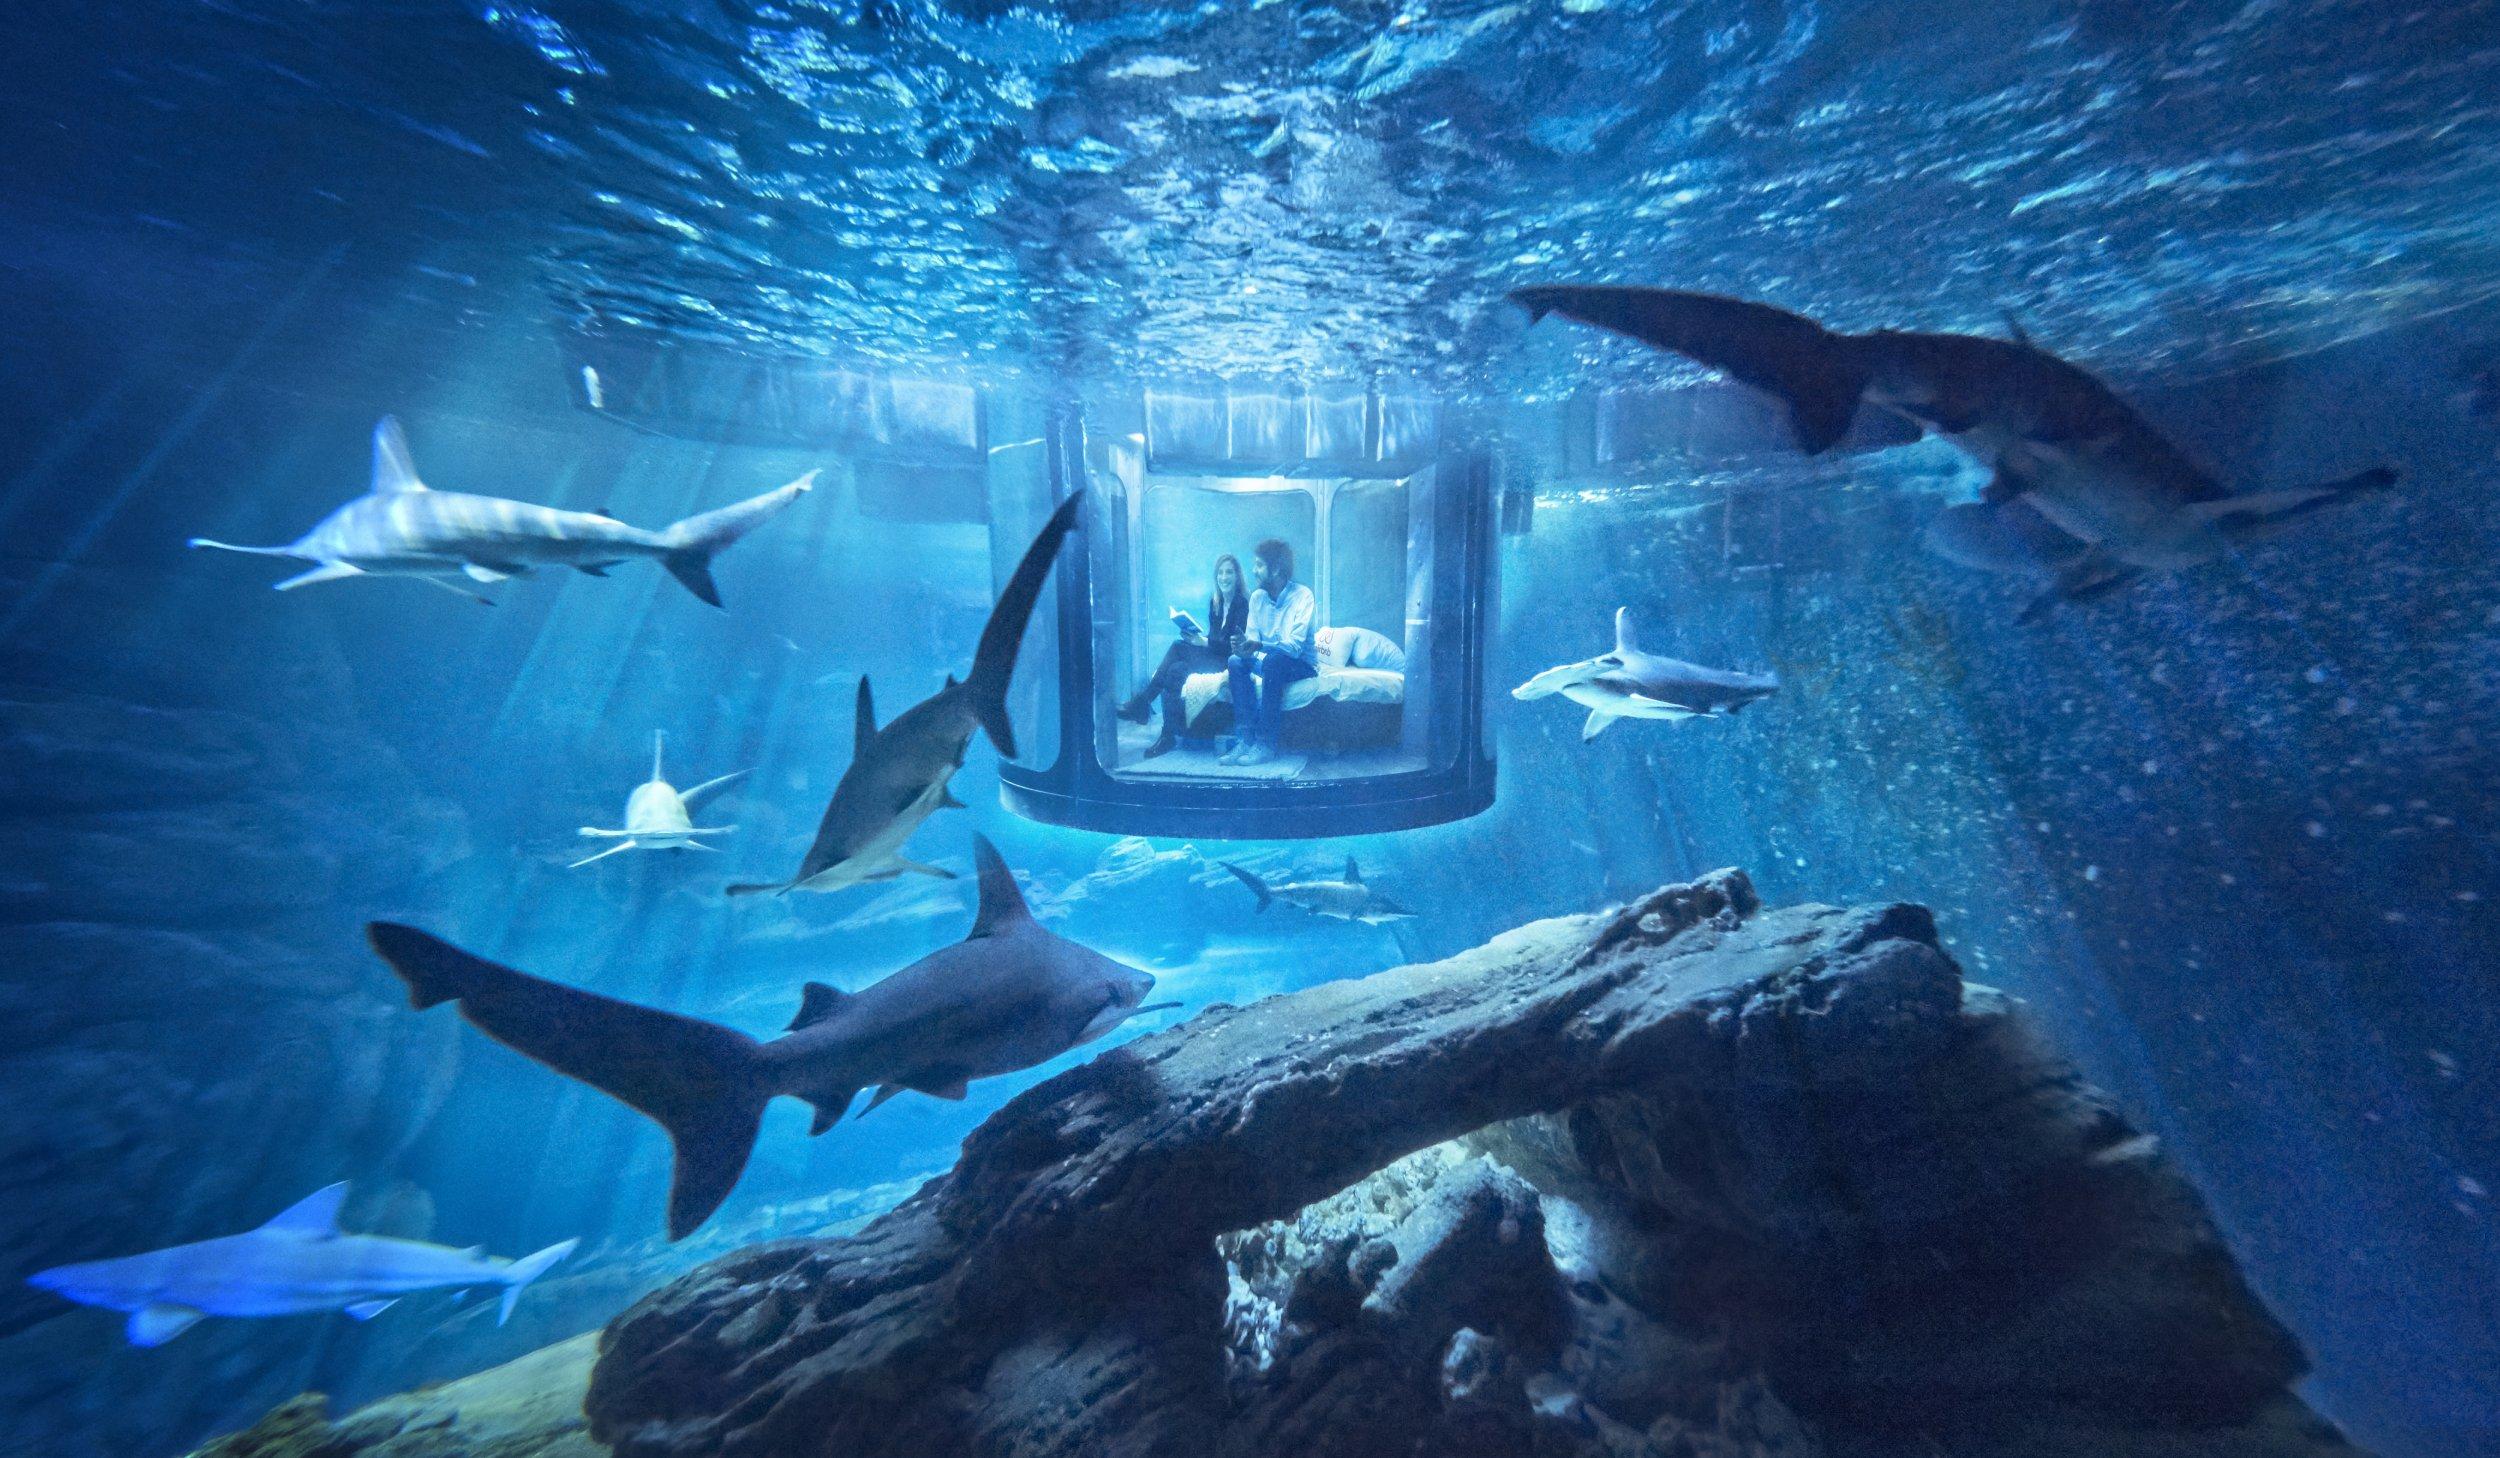 Aquarium de Paris hosts the first ever underwater bedroom on Airbnb Must link: https://www.airbnb.co.uk/night-at/shark-aquarium